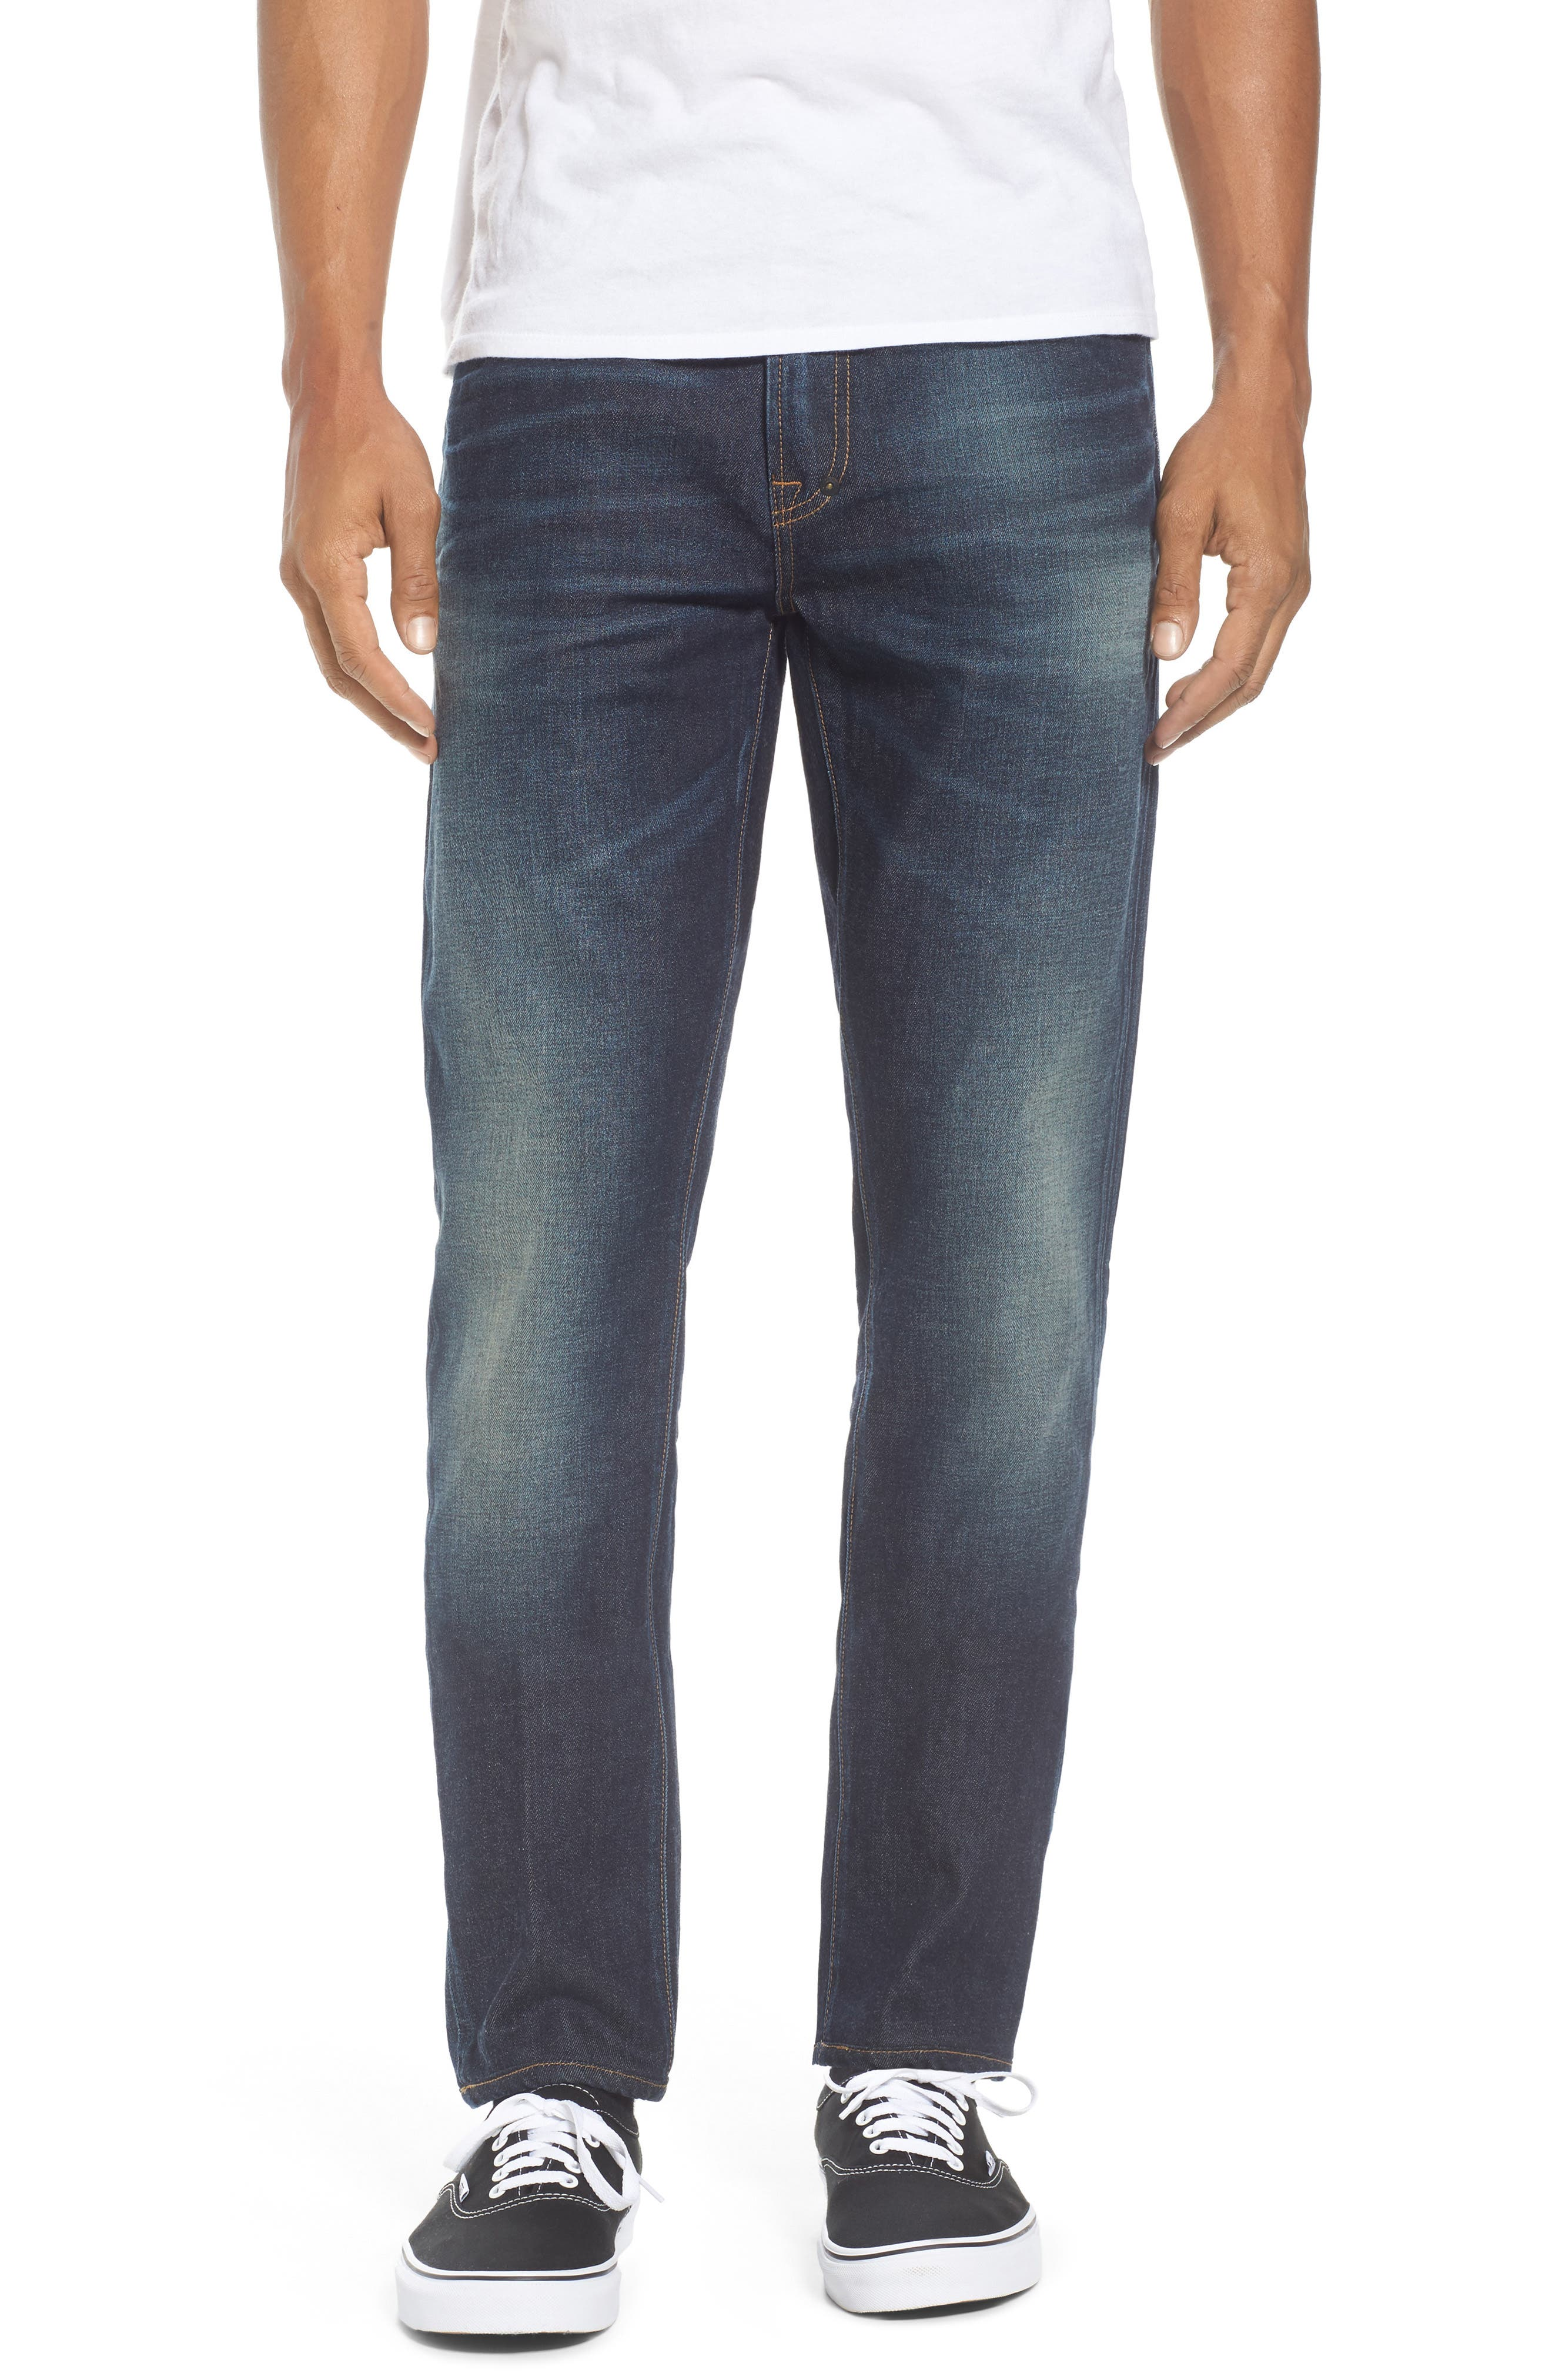 Windsor Slim Fit Jeans,                         Main,                         color, Medium